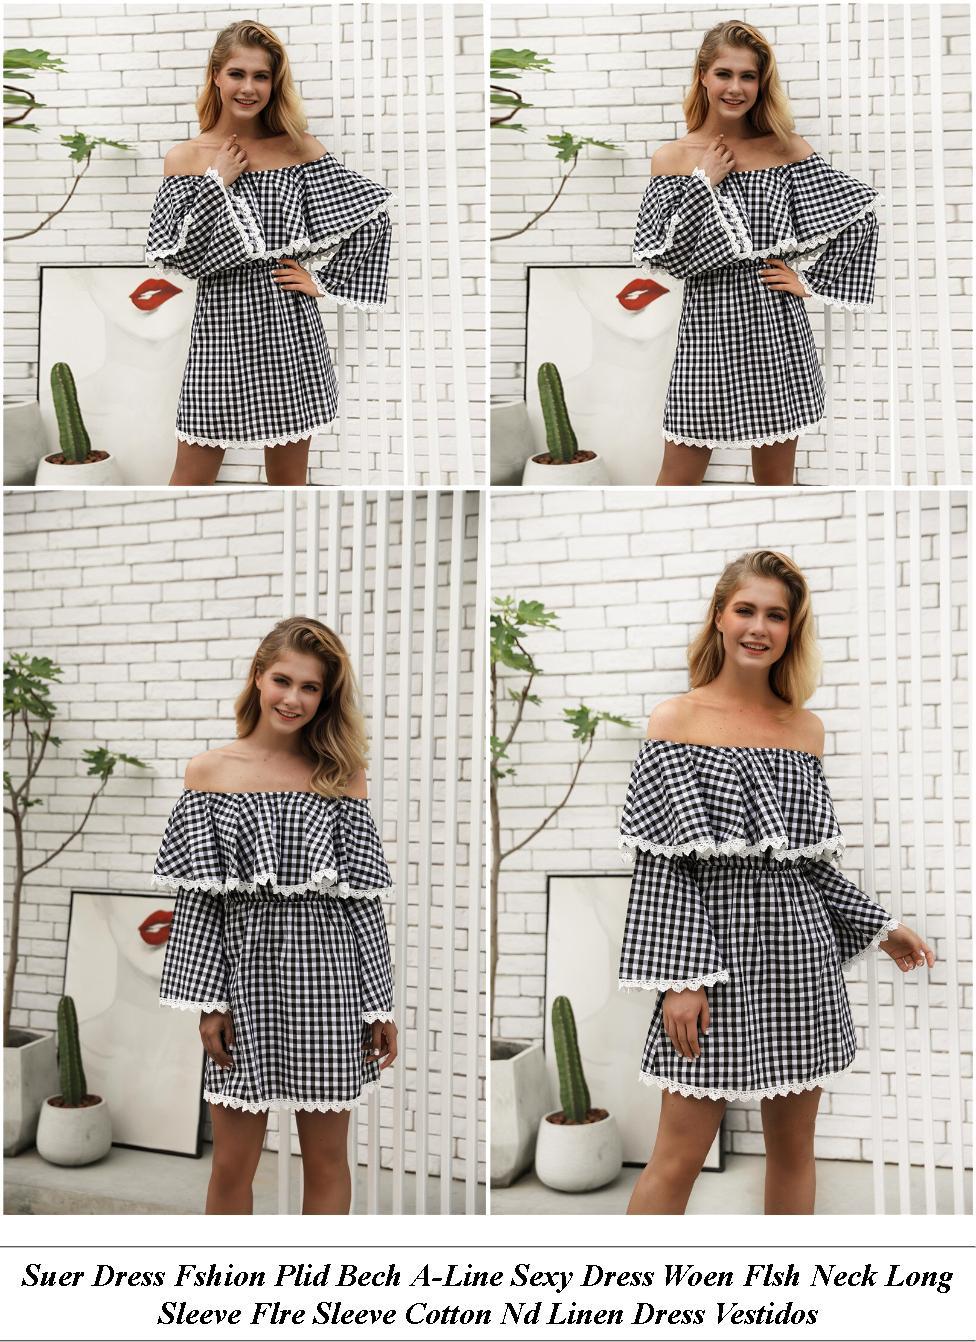 Plus Size Dresses - Womens Summer Clothes On Sale - Dress Sale - Cheap Name Brand Clothes